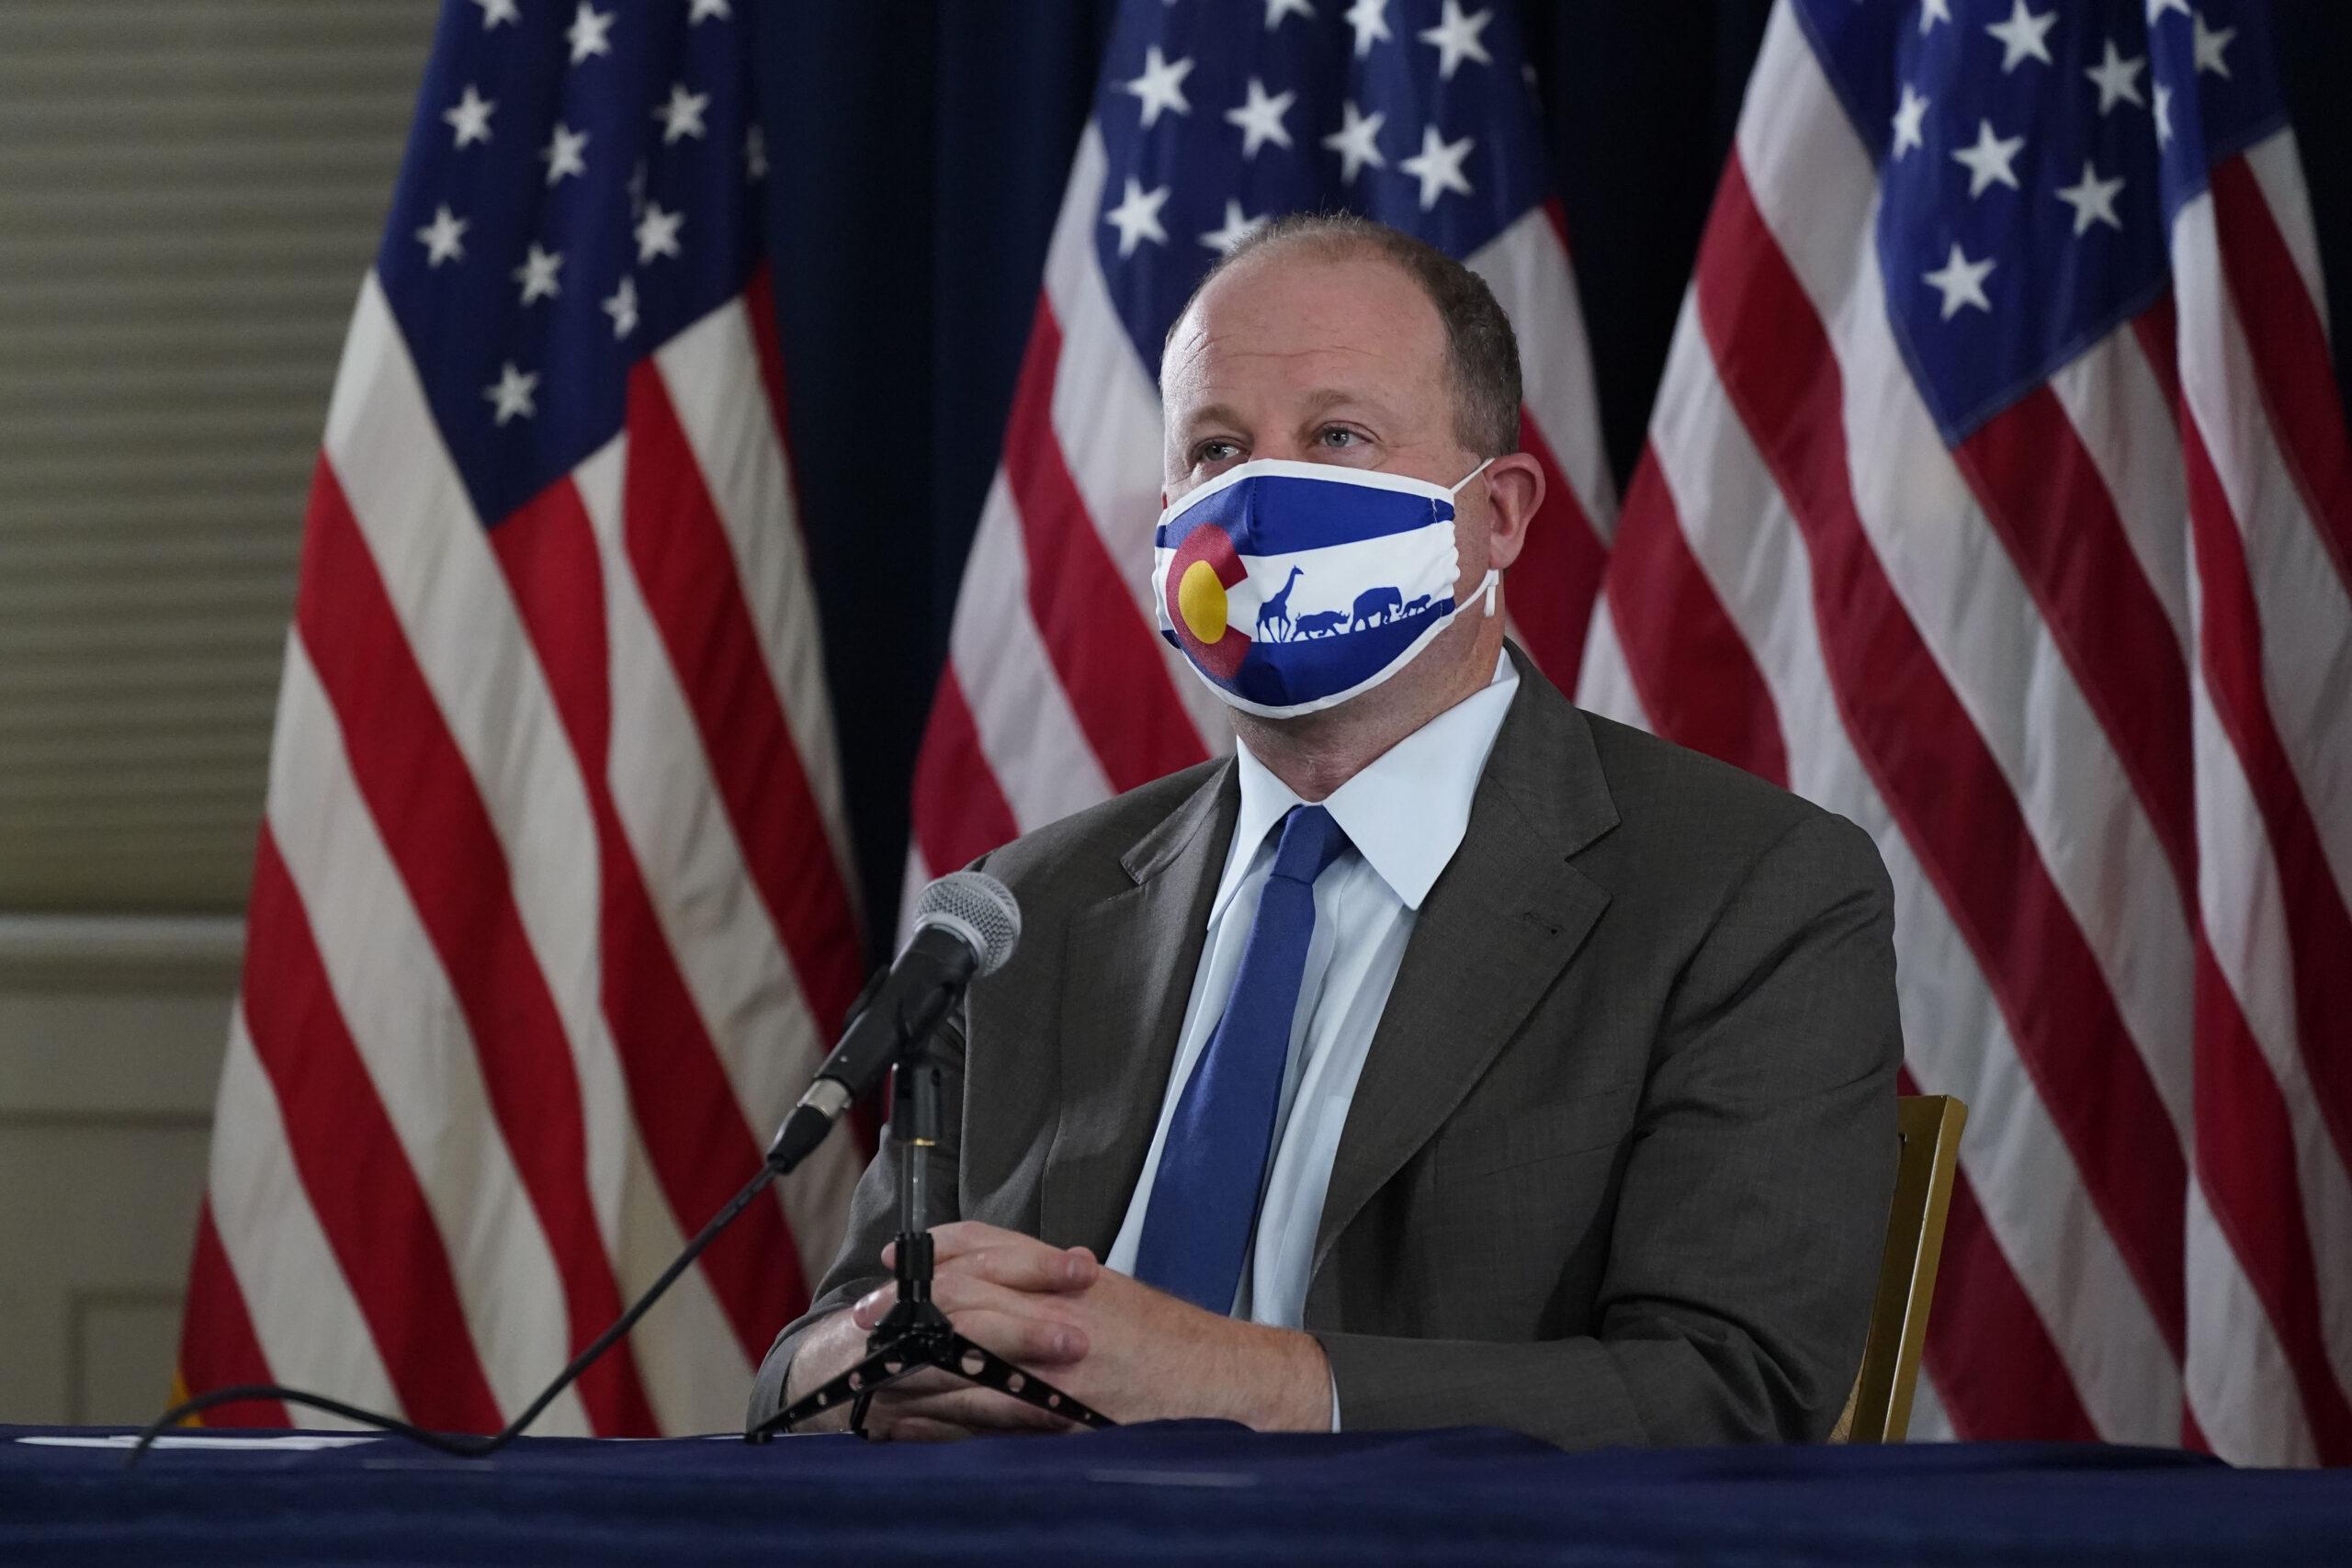 Colorado Gov. Jared Polis in a face mask.